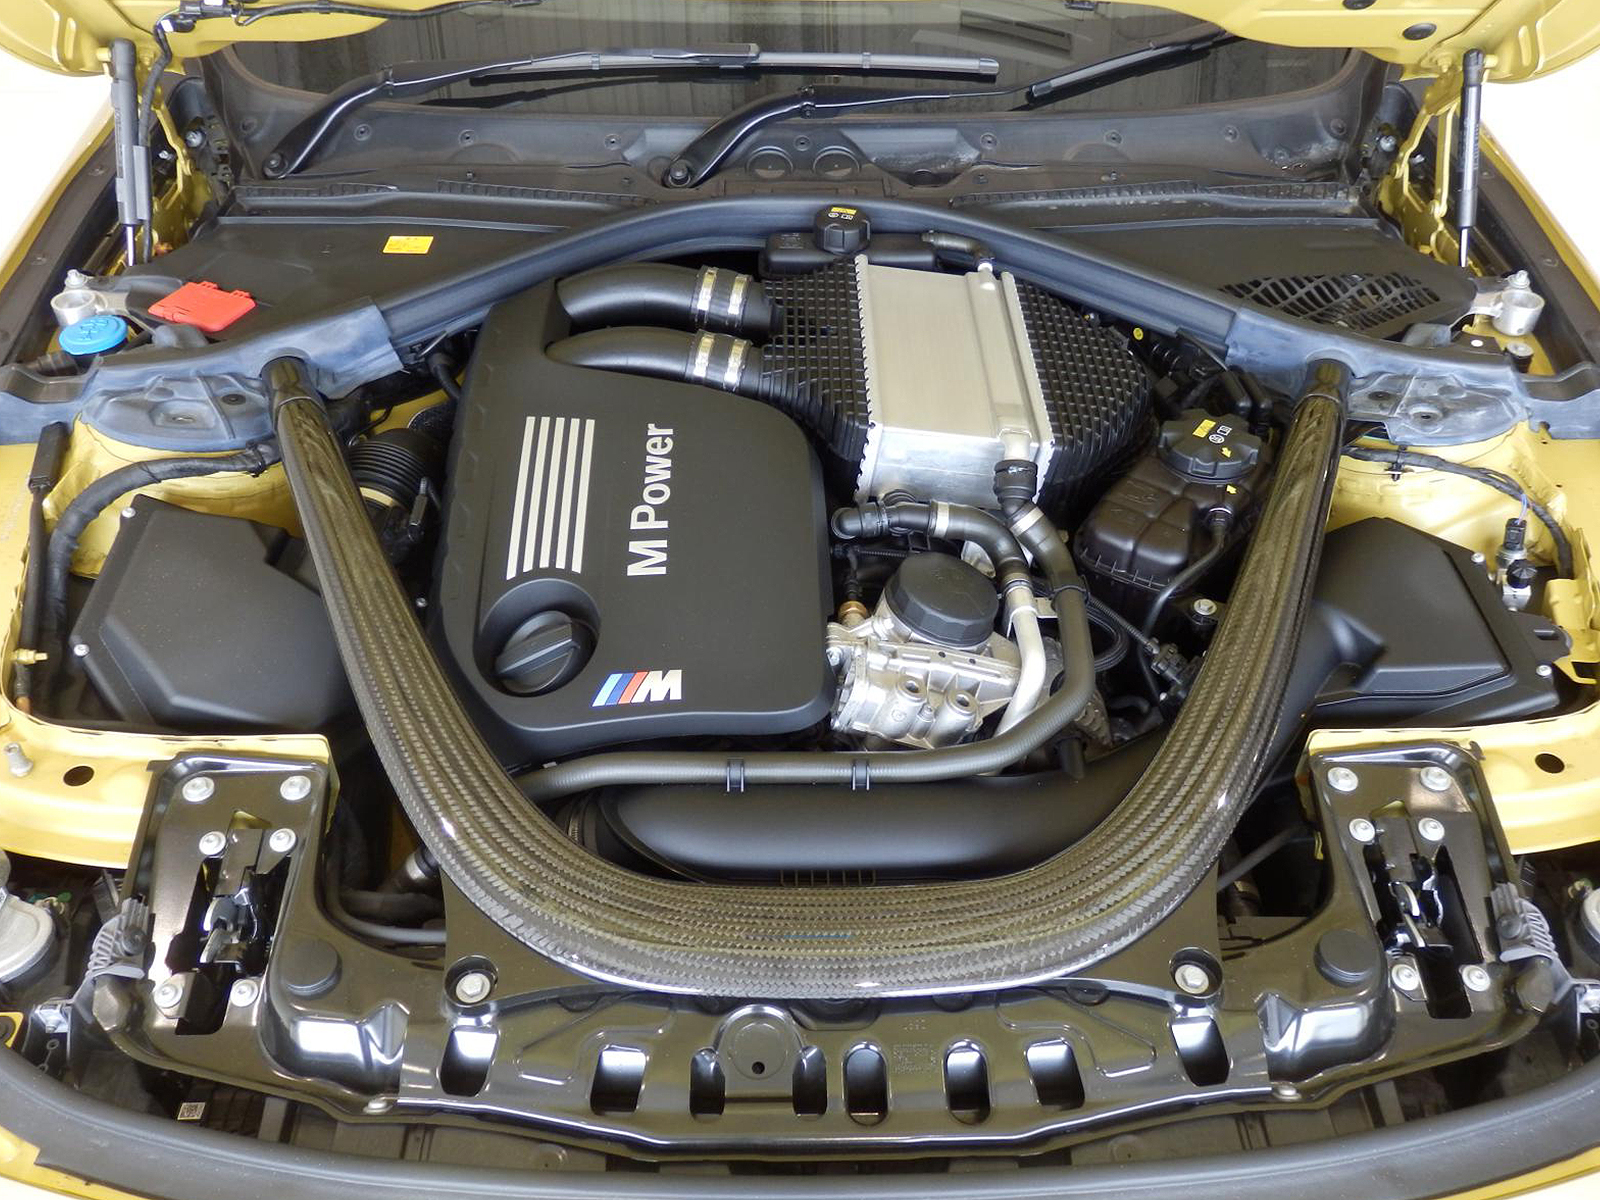 BMW M4 クーペ オースチンイエロー エンジン